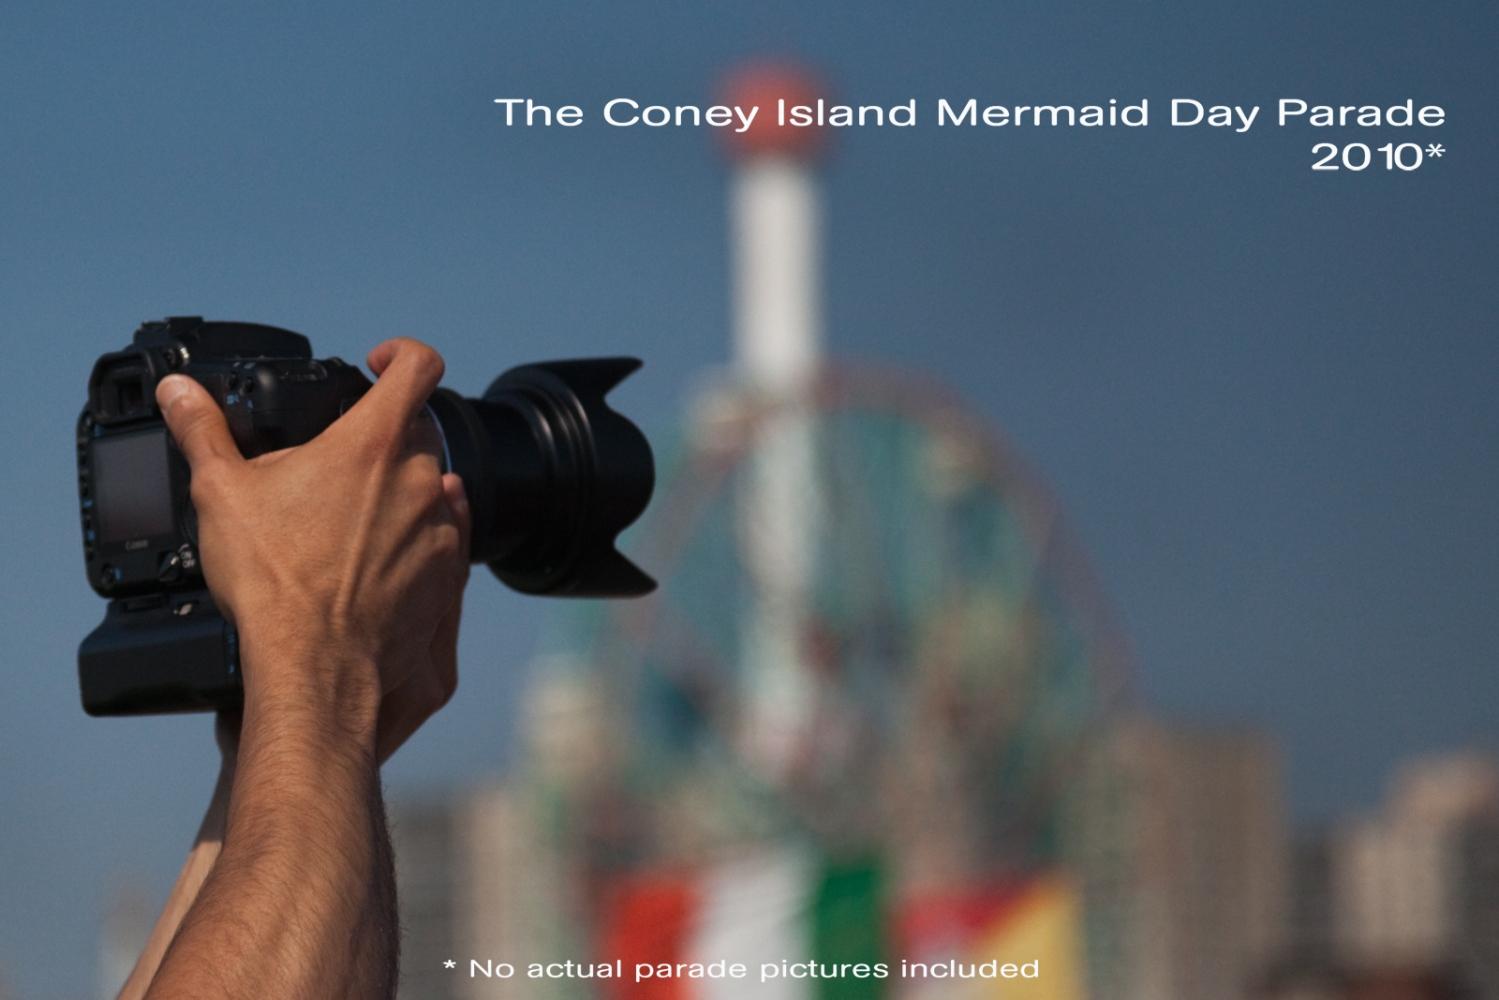 Art and Documentary Photography - Loading 01_mwebster_mermaid2010.JPG